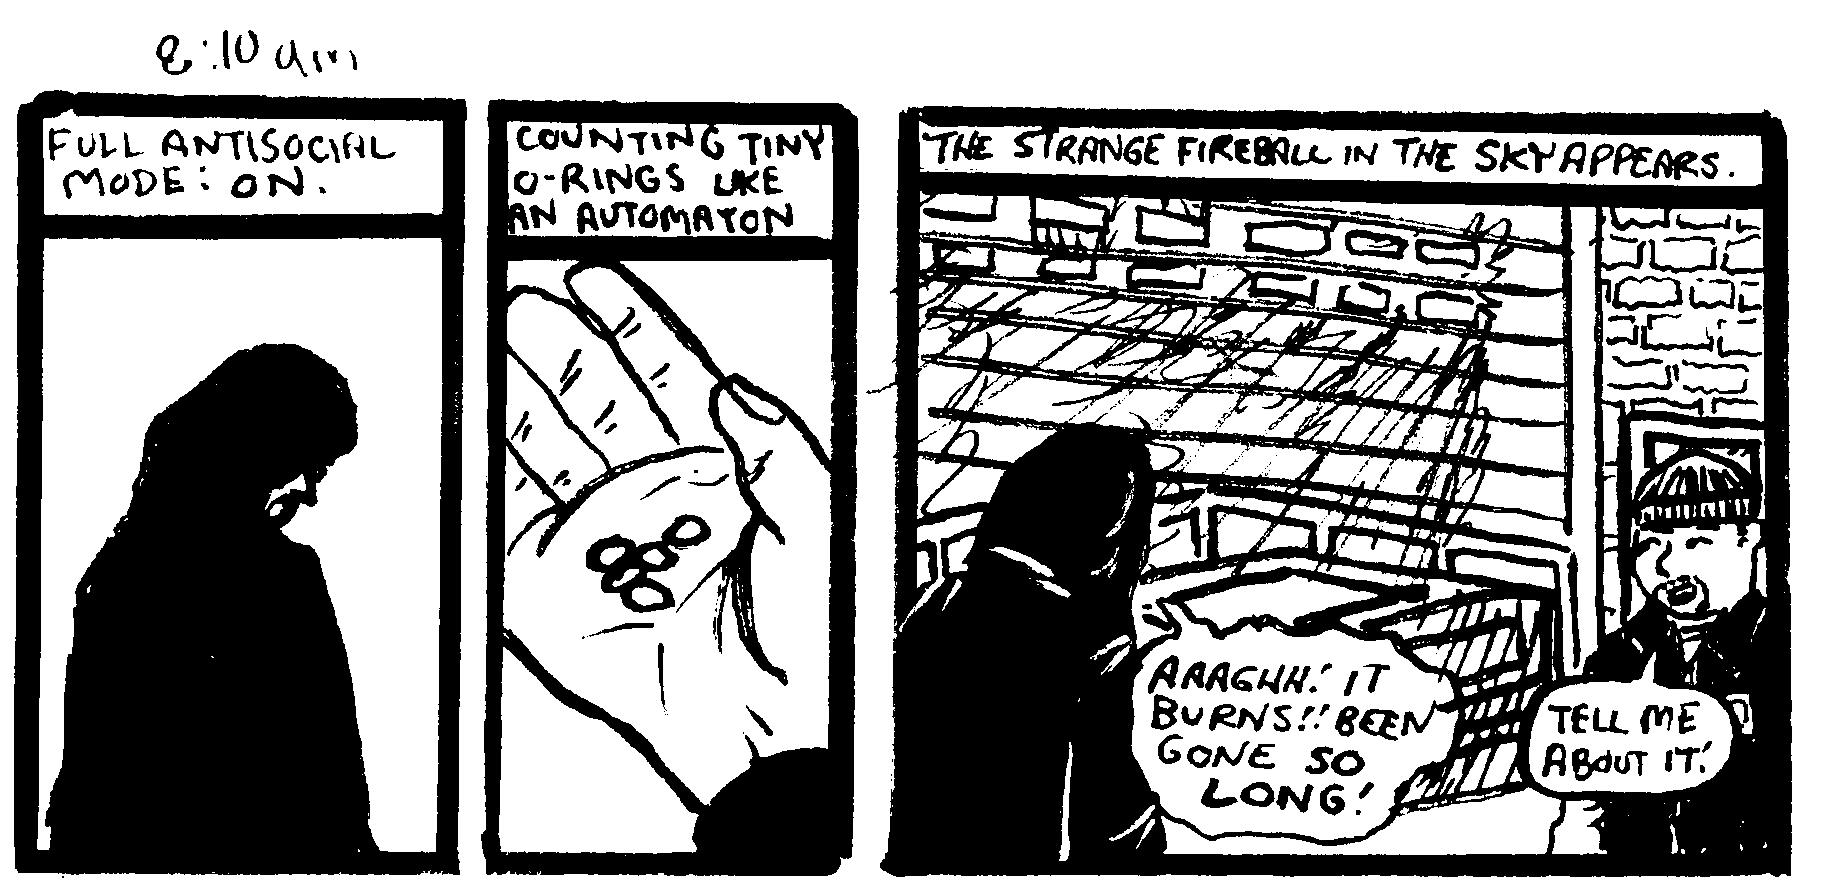 Hourly Comics Day Feb. 1st 2017